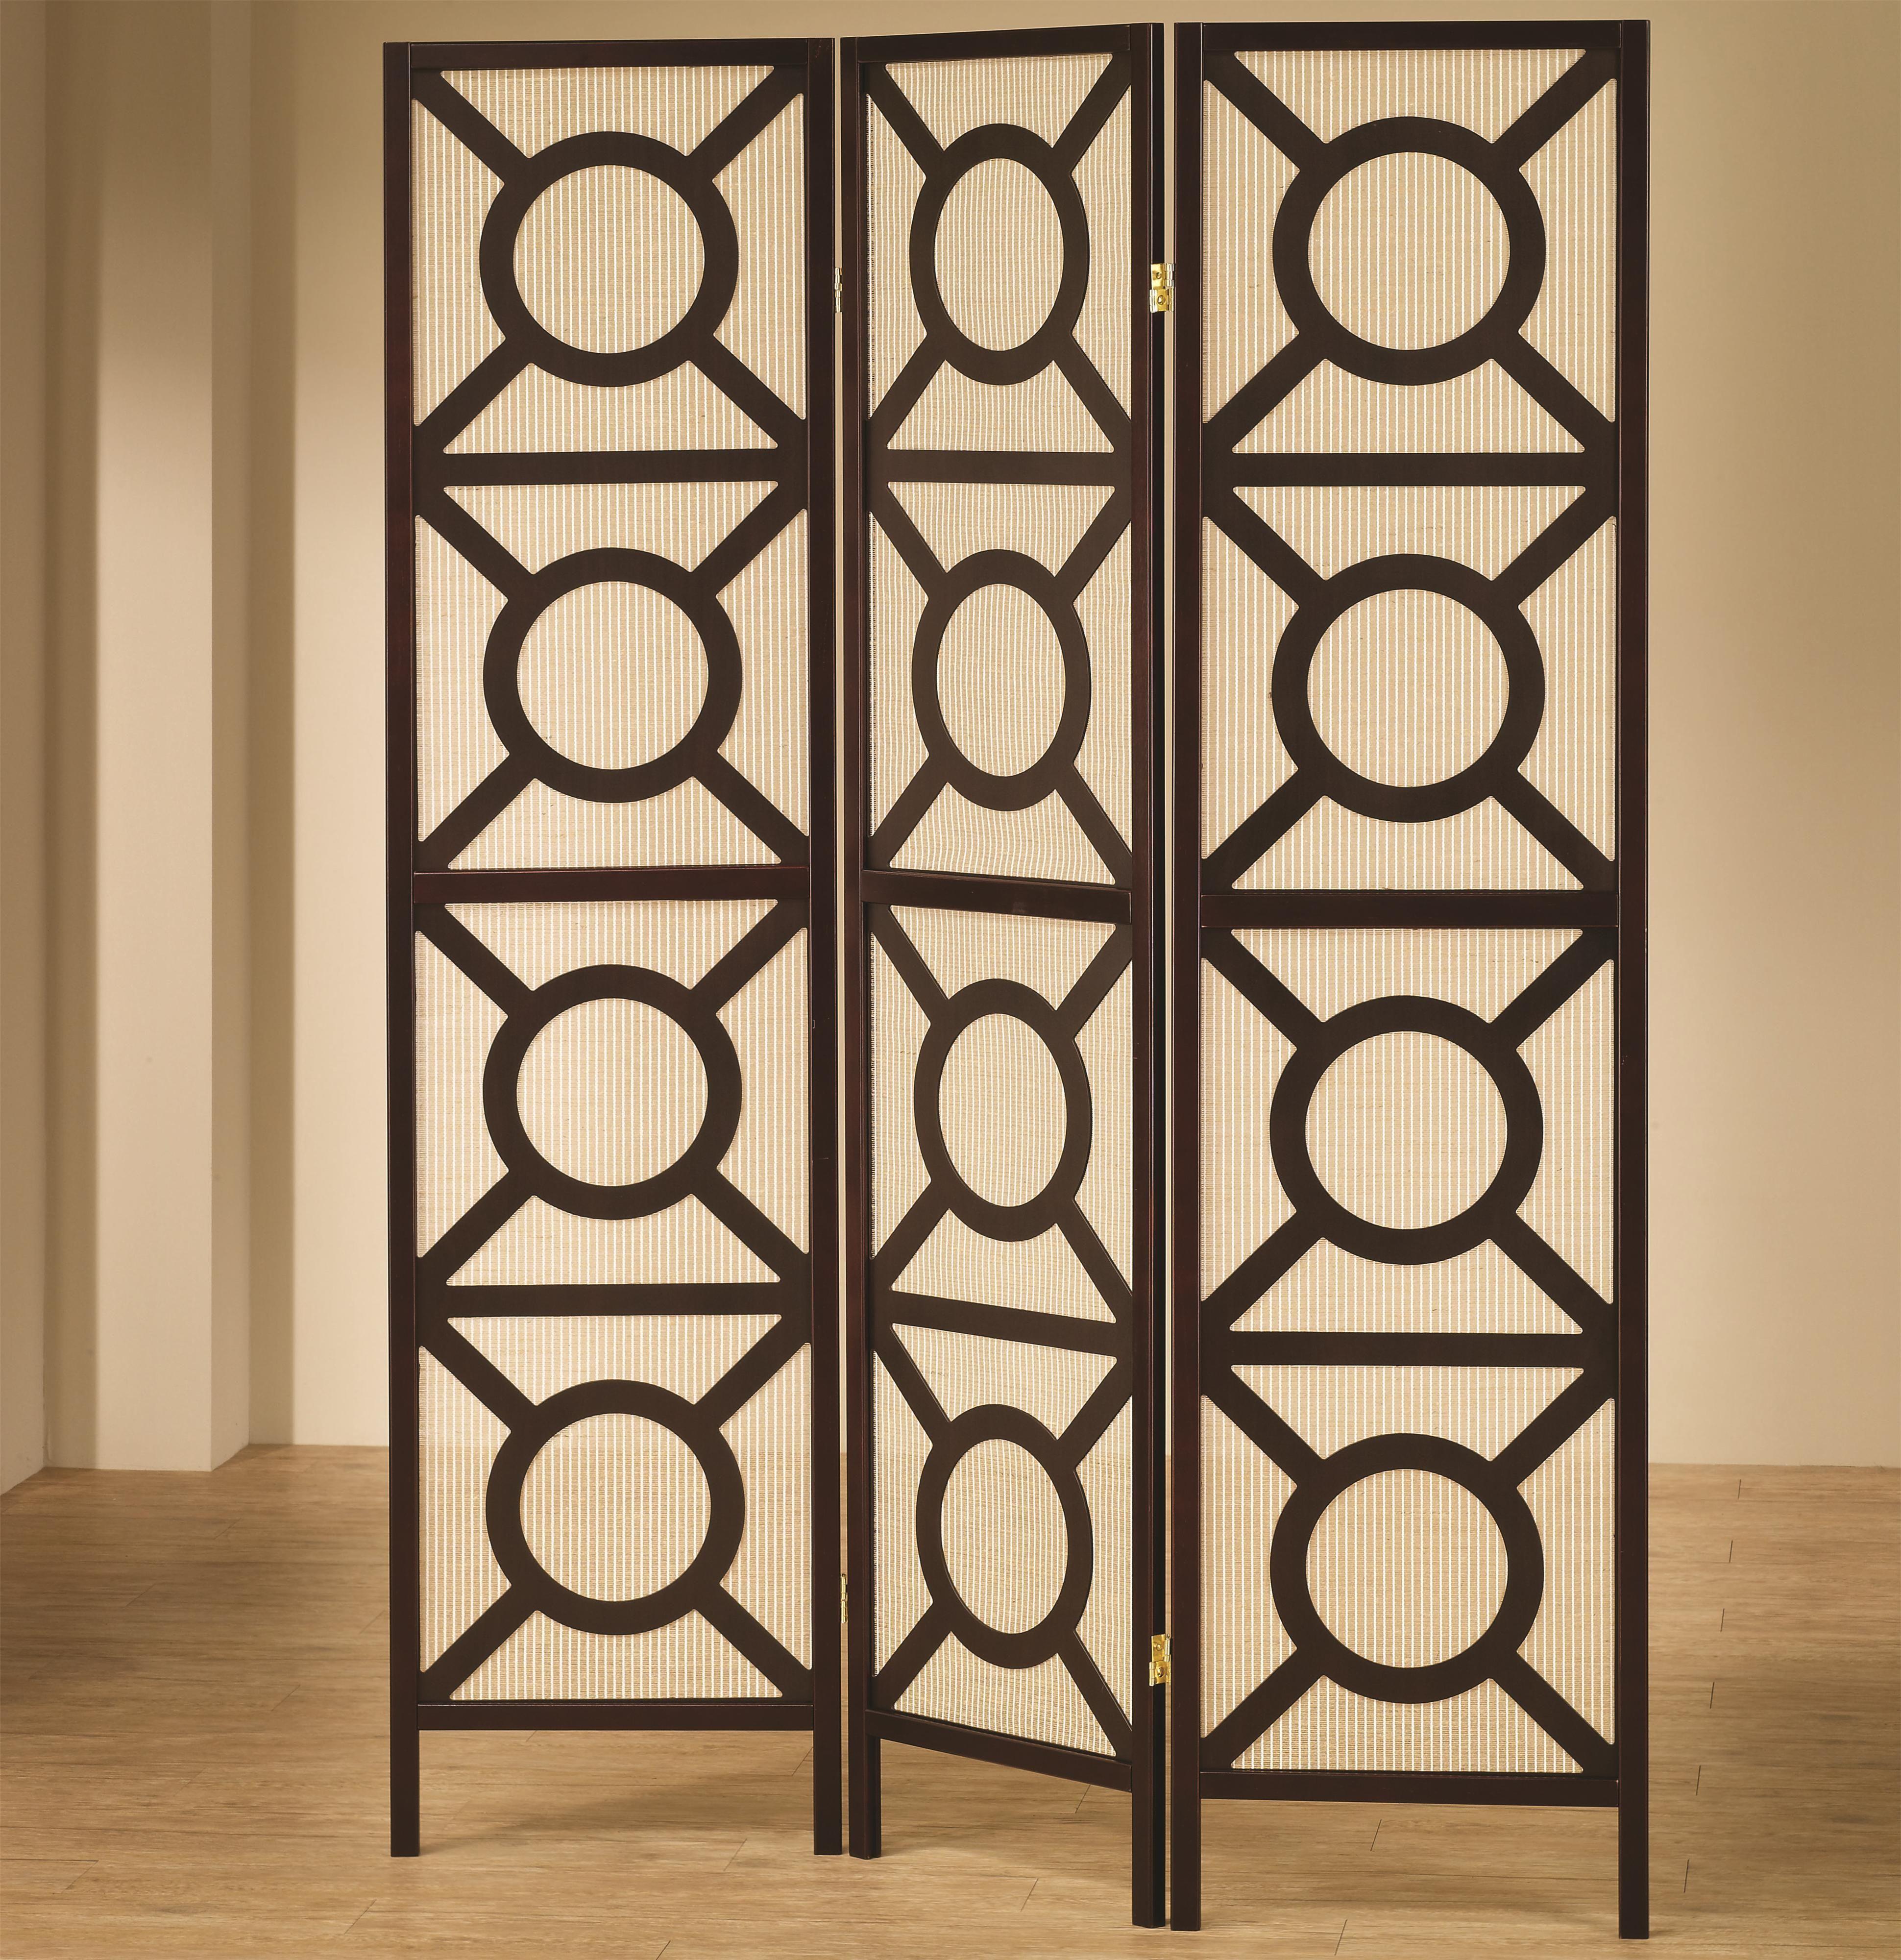 900090 Coaster 3 Panel Espresso Finish Wood Frame Room Divider Shoji Screen With Circles Design Measures Wide Panels X H